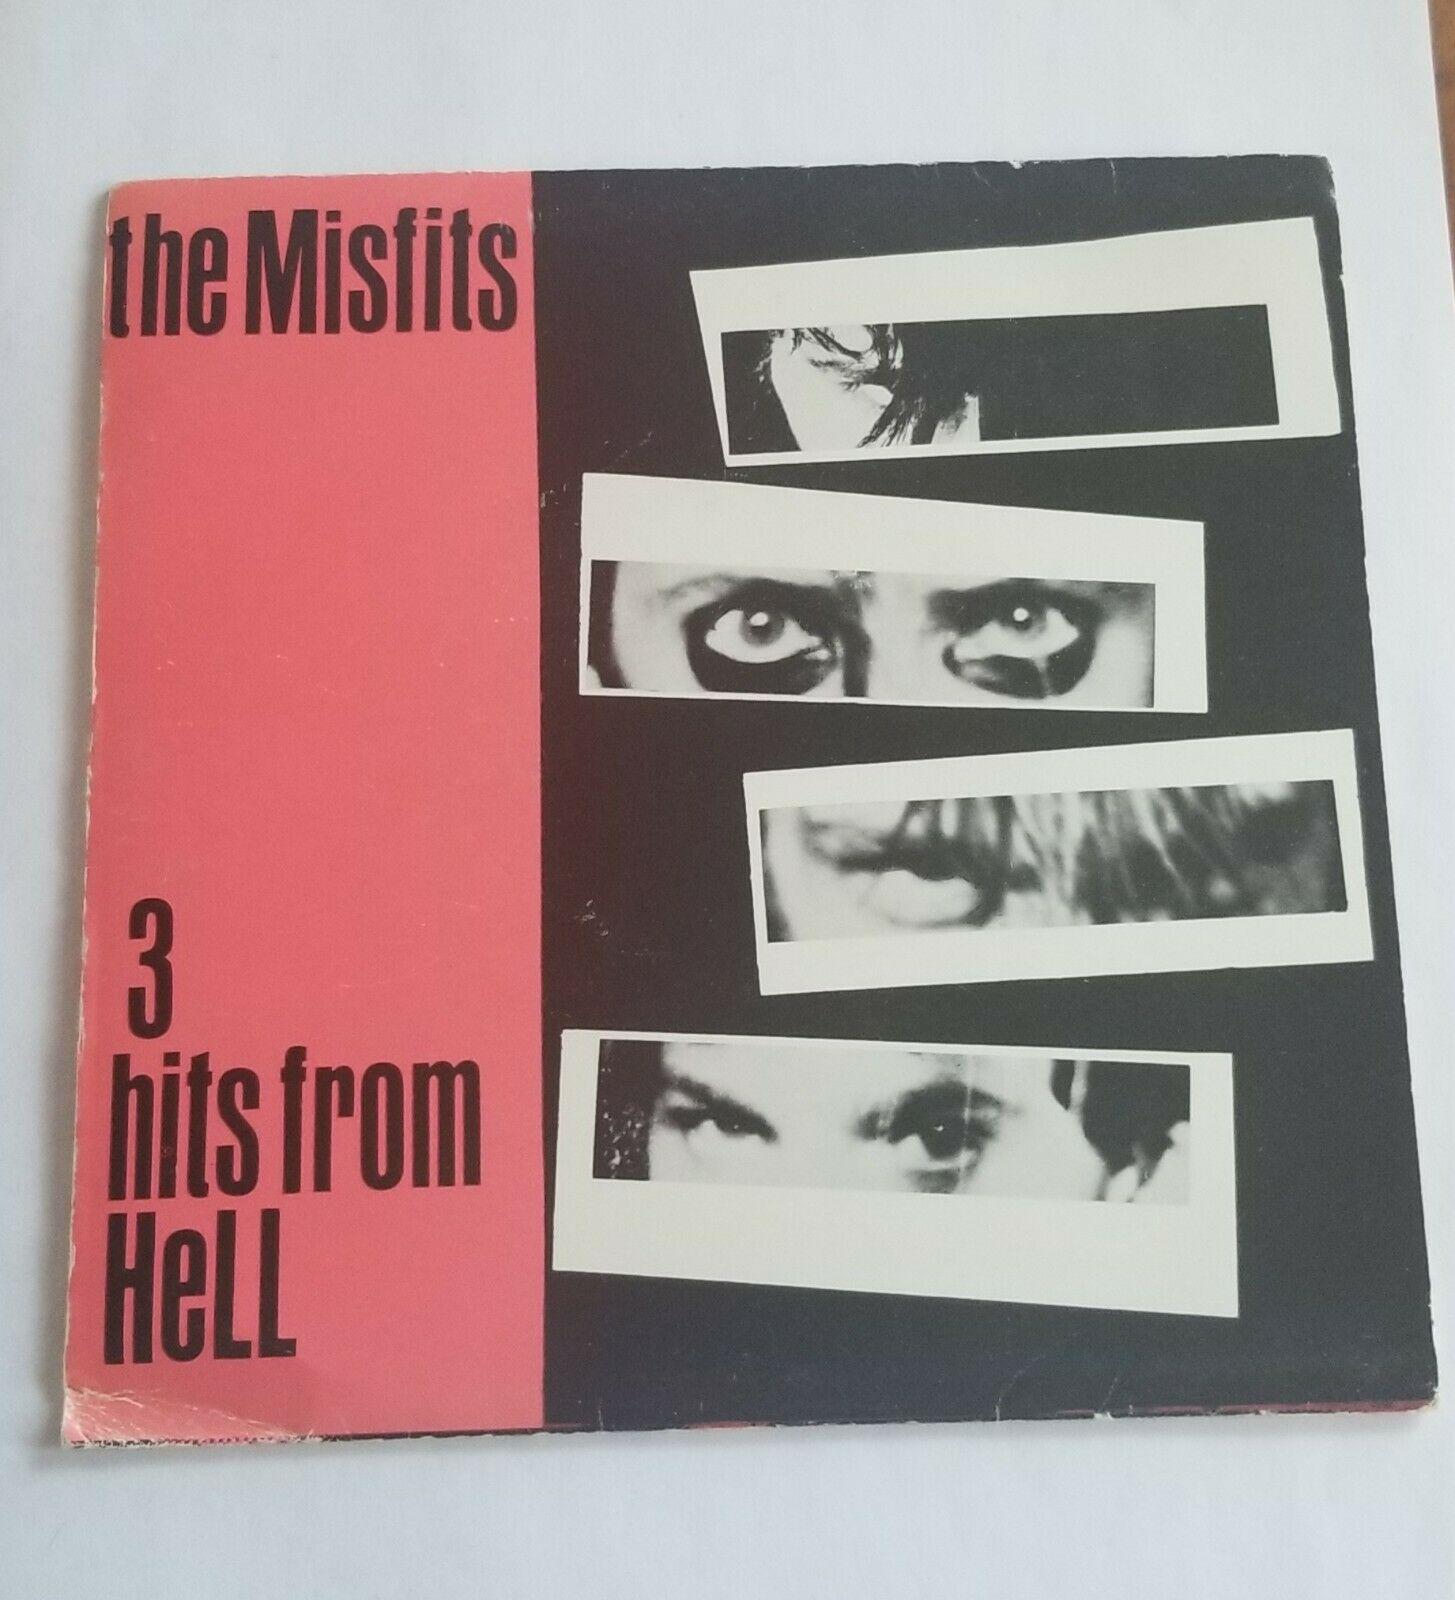 Misfits 3 hits from hell 7  vinyl